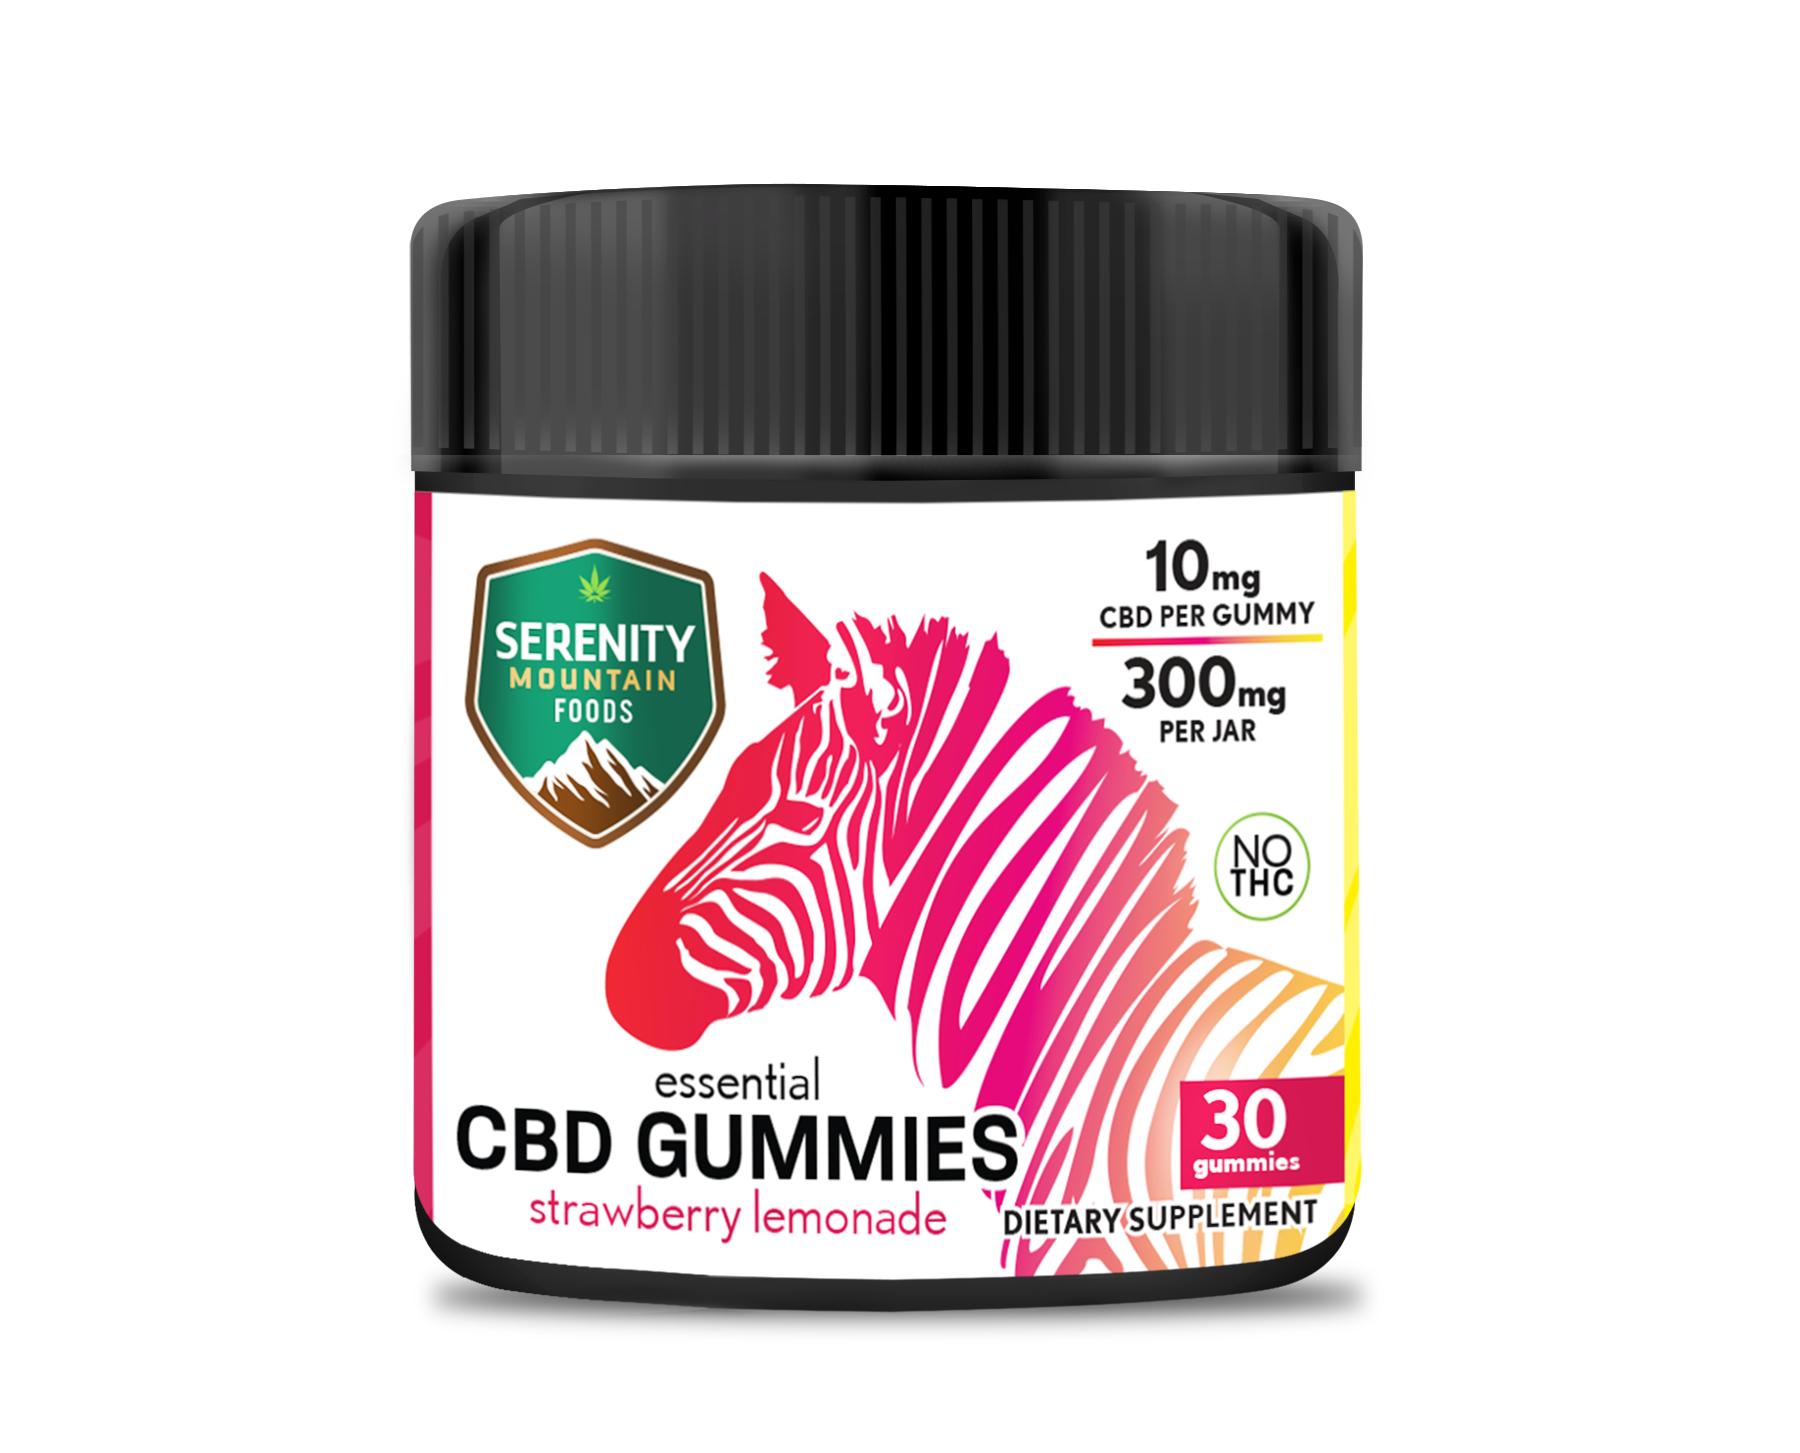 CBD Gummies Strawberry Lemonade